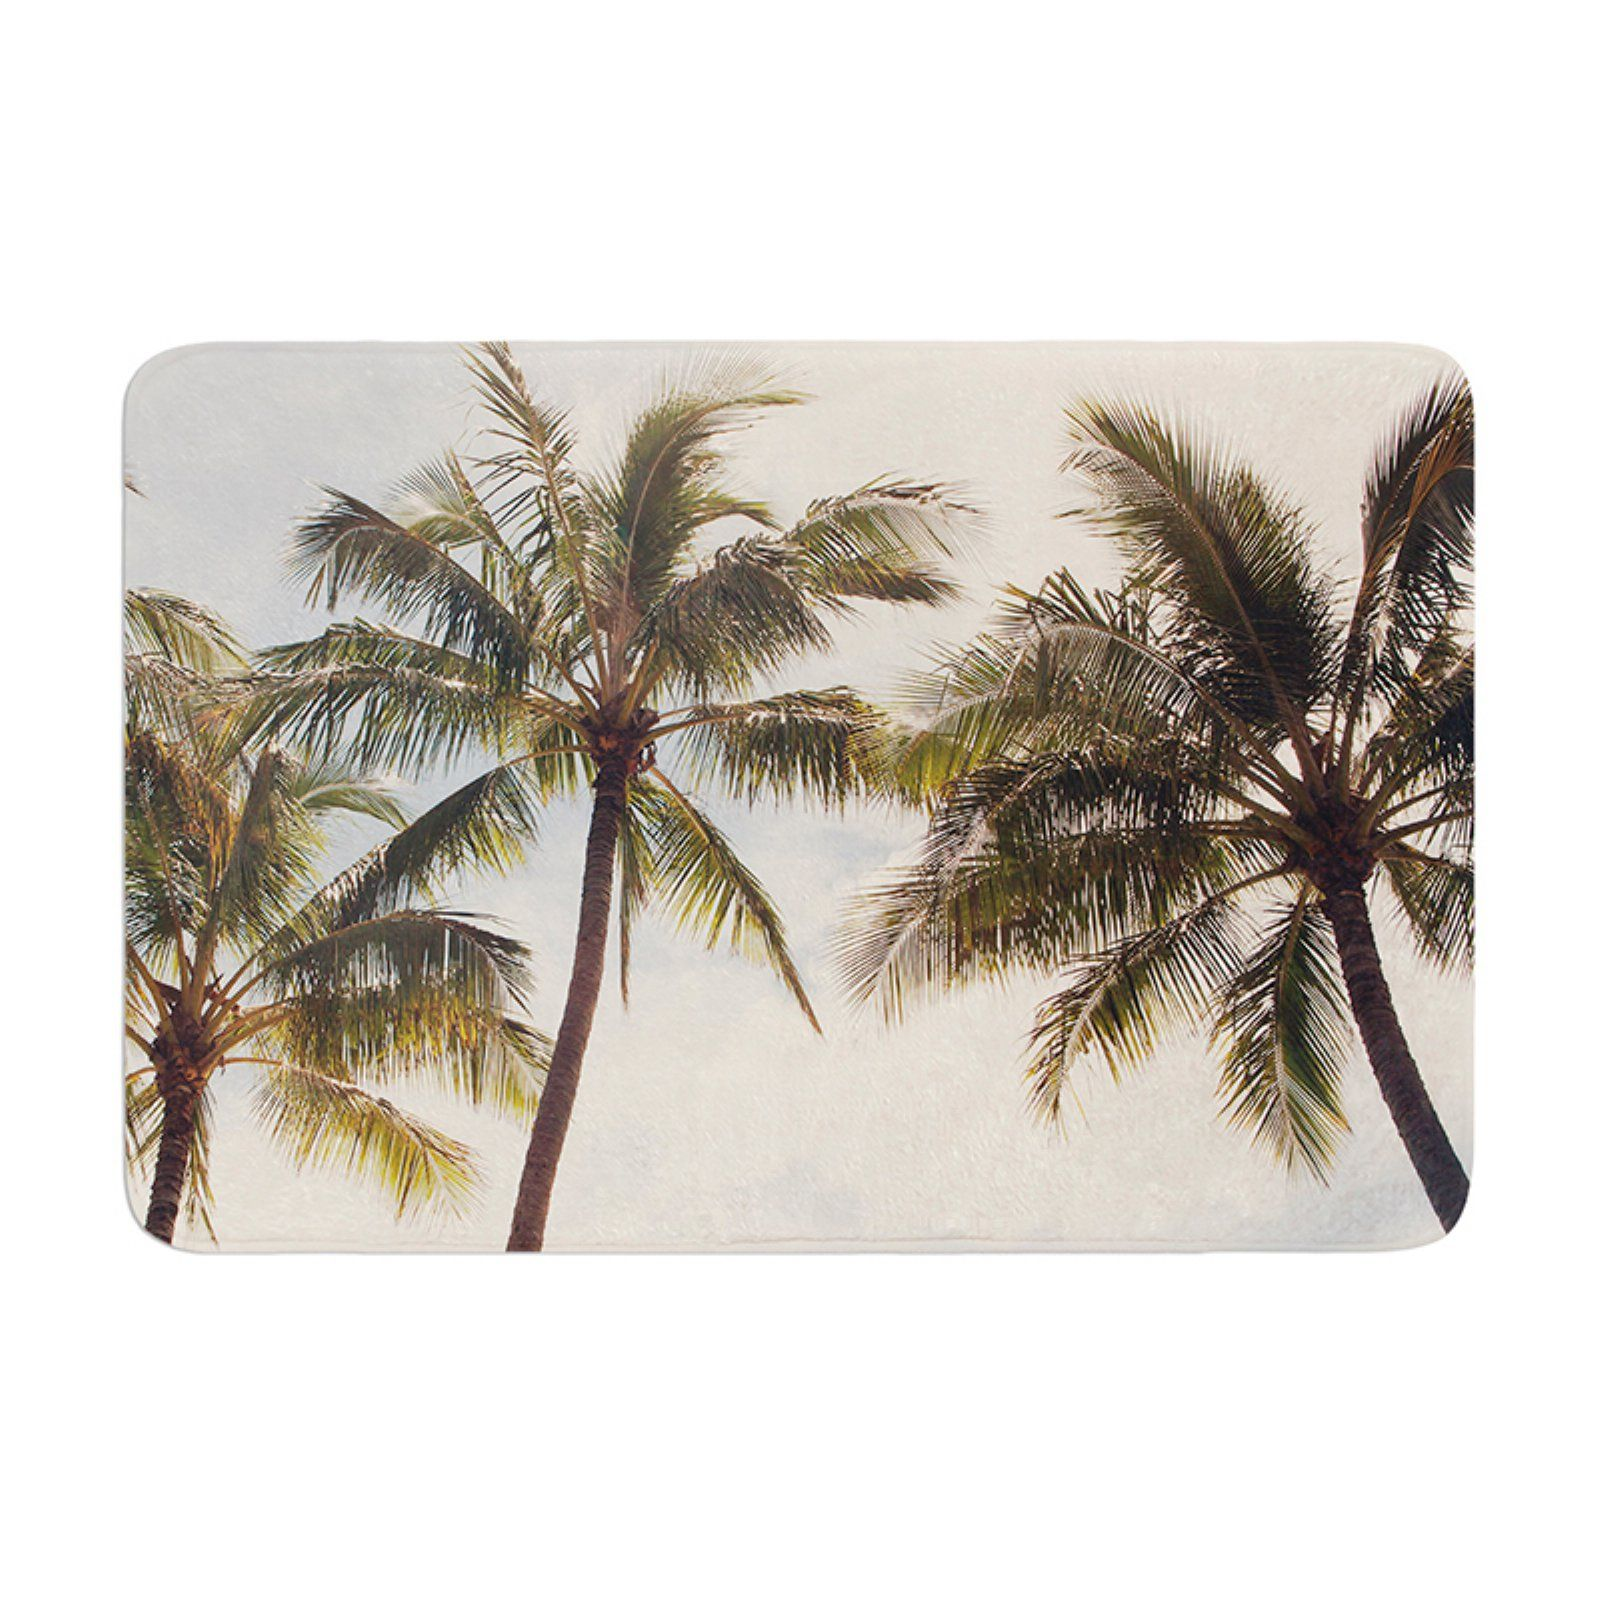 Coastal Trees 20 by 20 Kess InHouse Catherine McDonald Boho Palms Throw Pillow